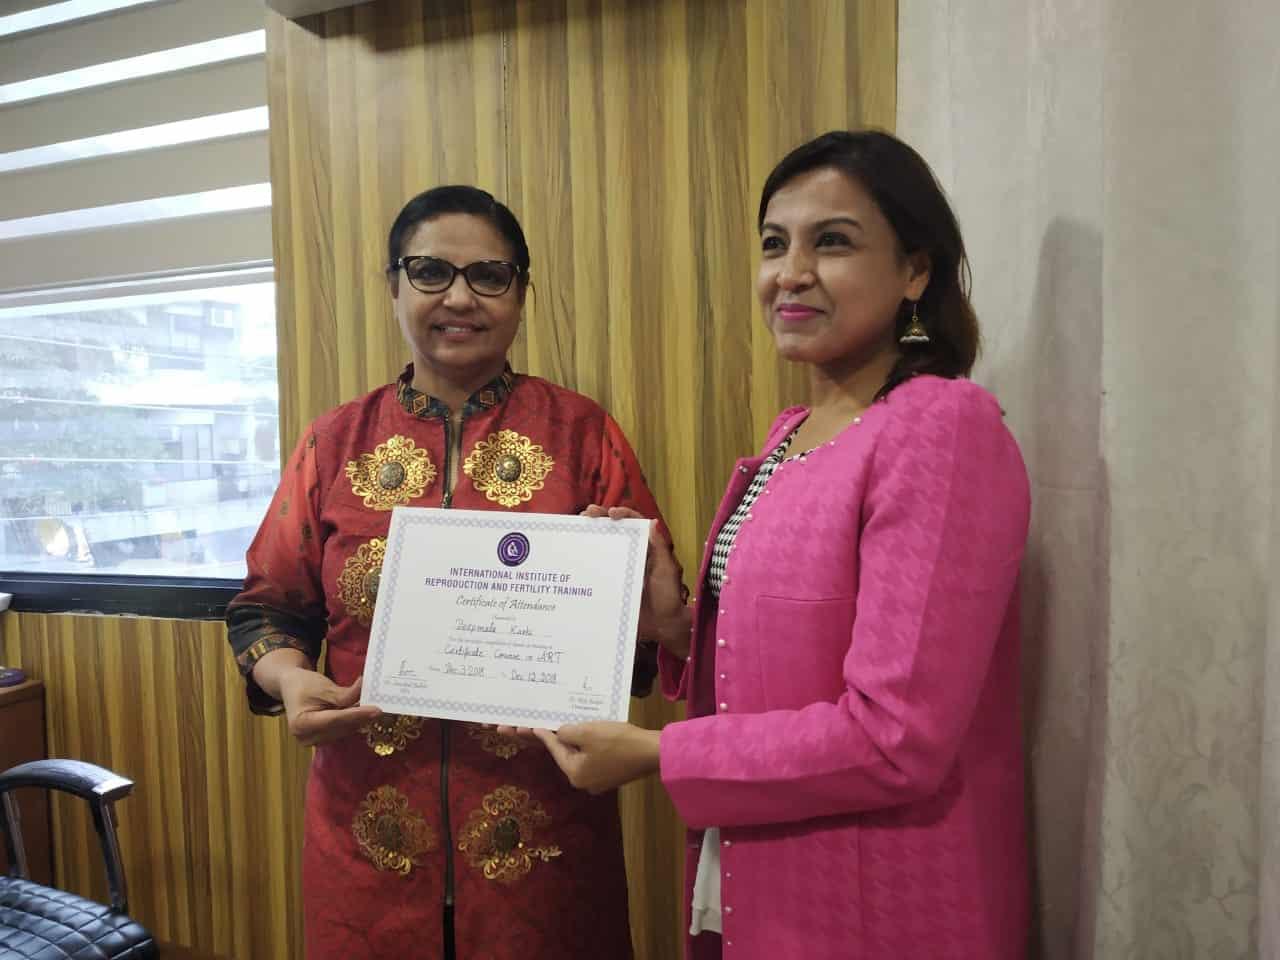 Dr. Deepmala Karki